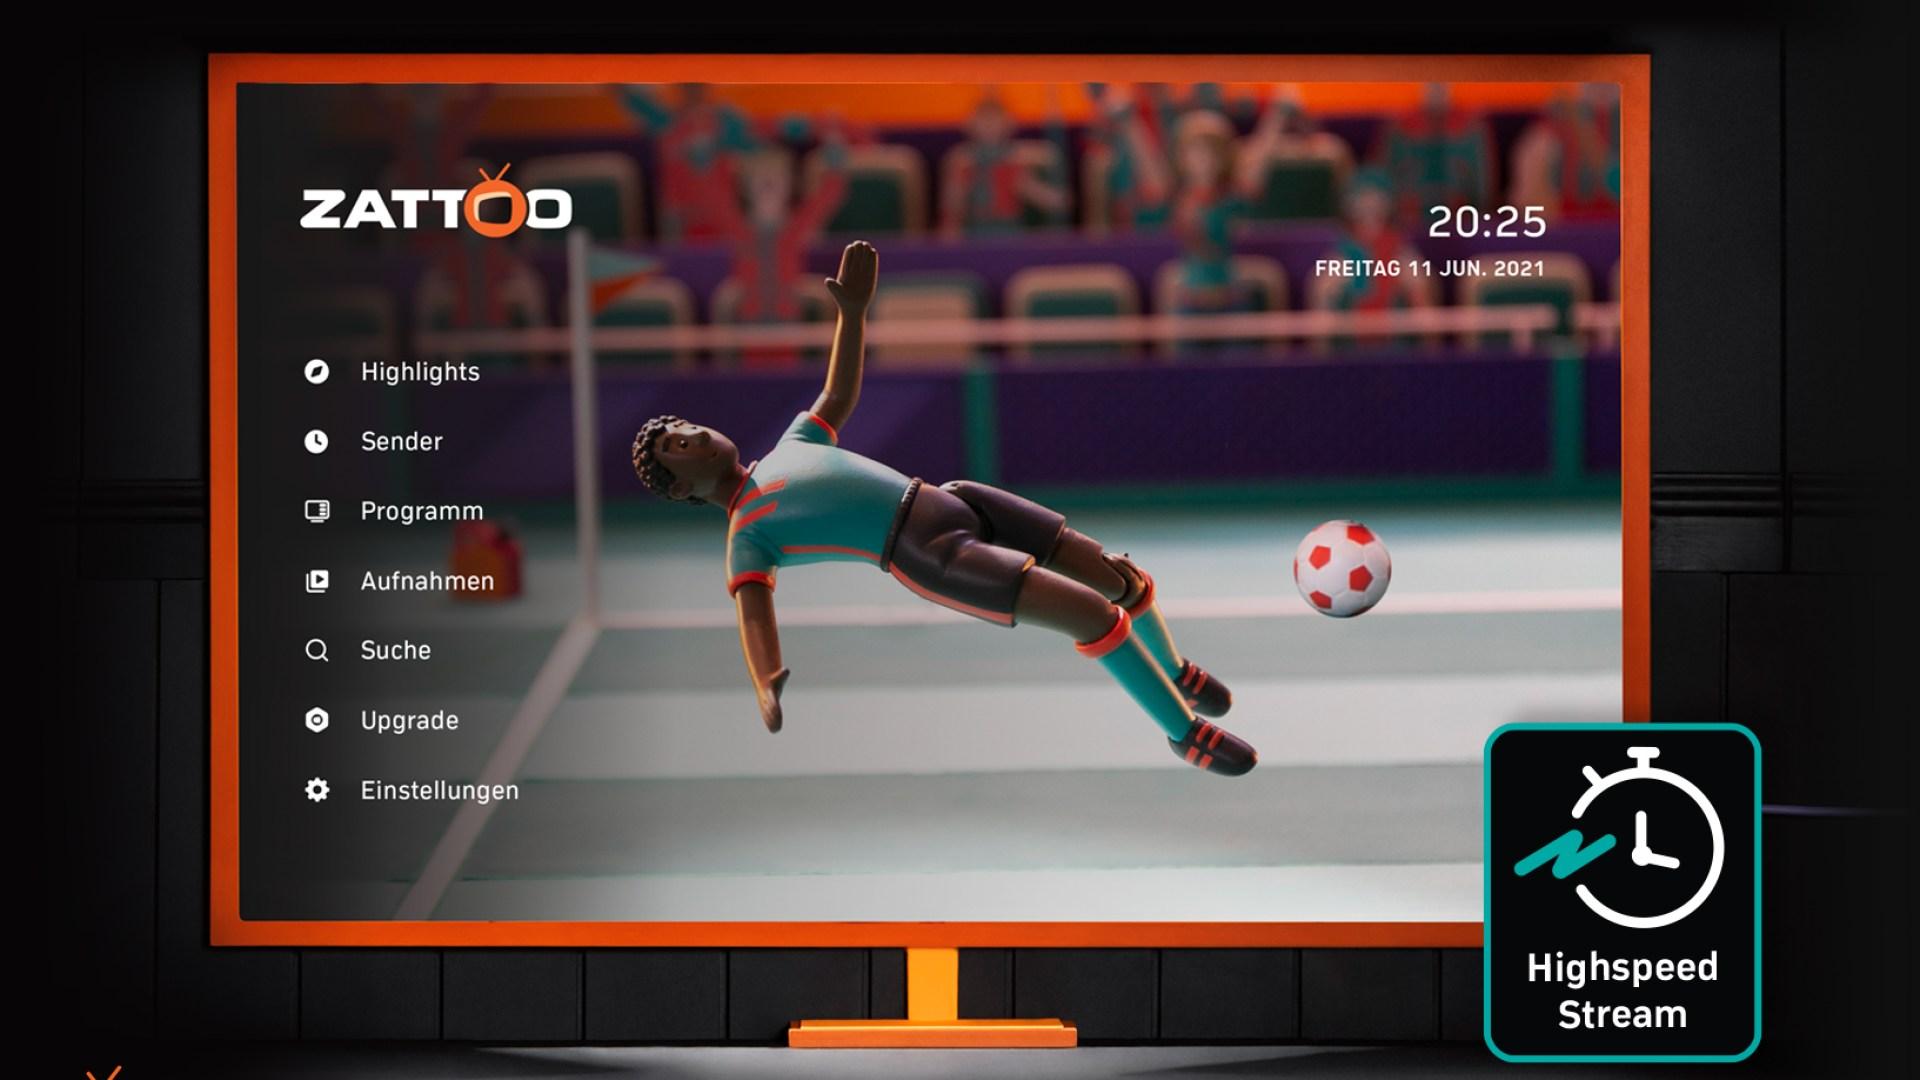 Streamingportal, Videostreaming, Fußball, Zattoo